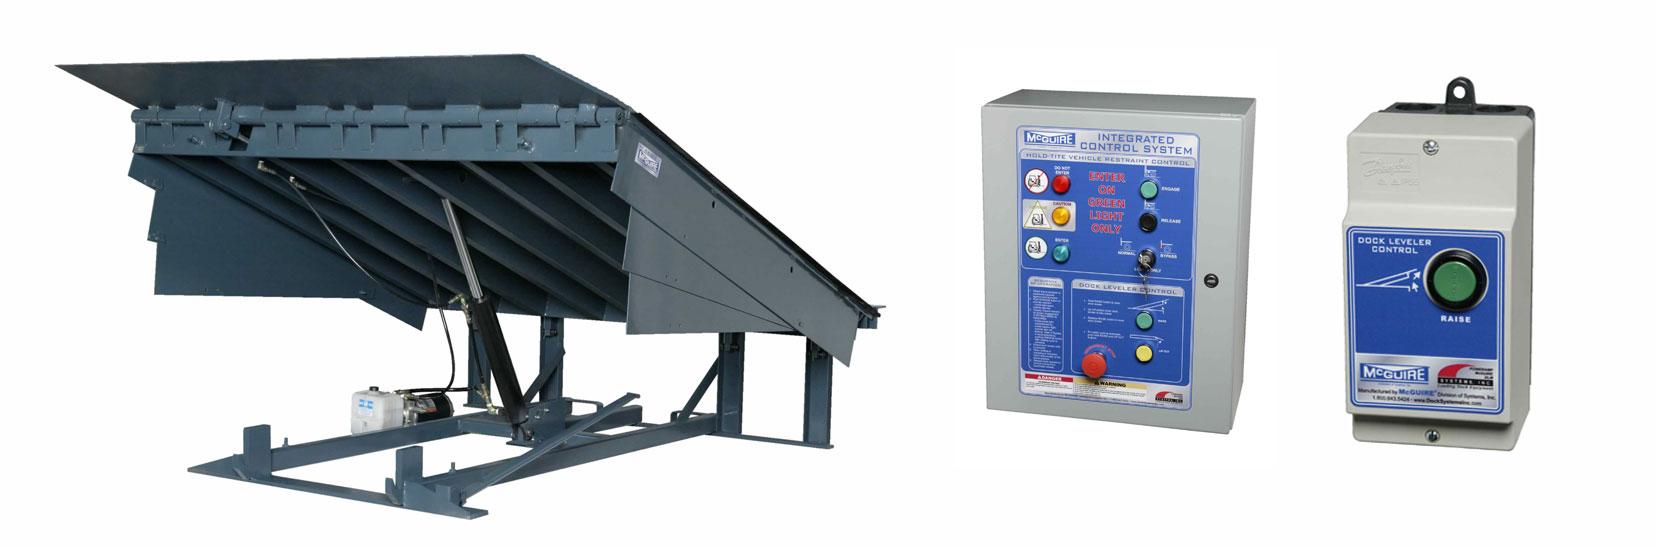 Mcguire Hydraulic Levelers